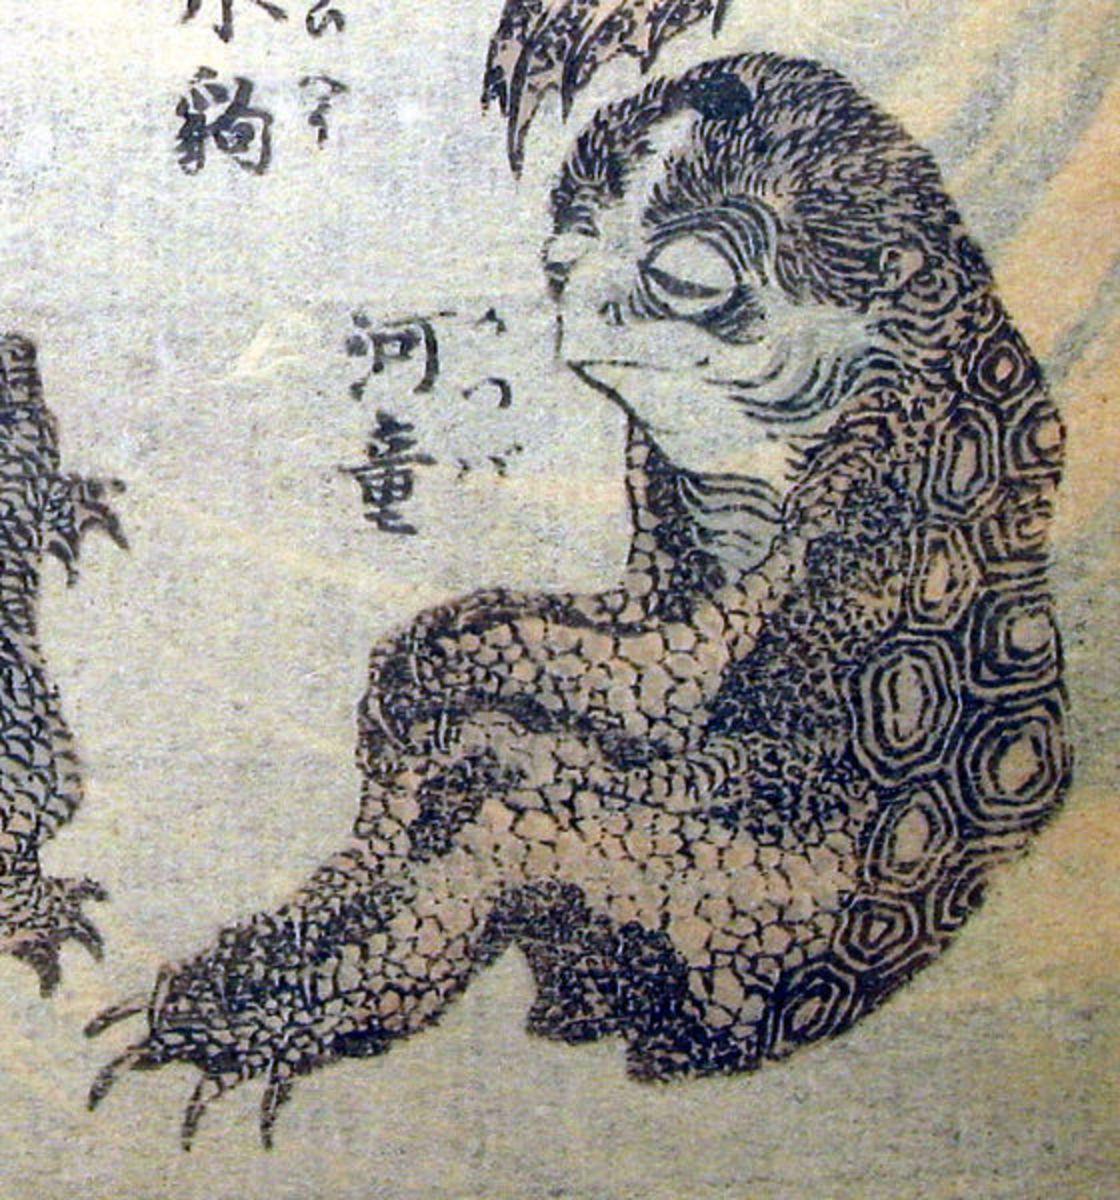 Depiction of a kappa by ukiyo-e master Katsushika Hokusai (1760-1849).